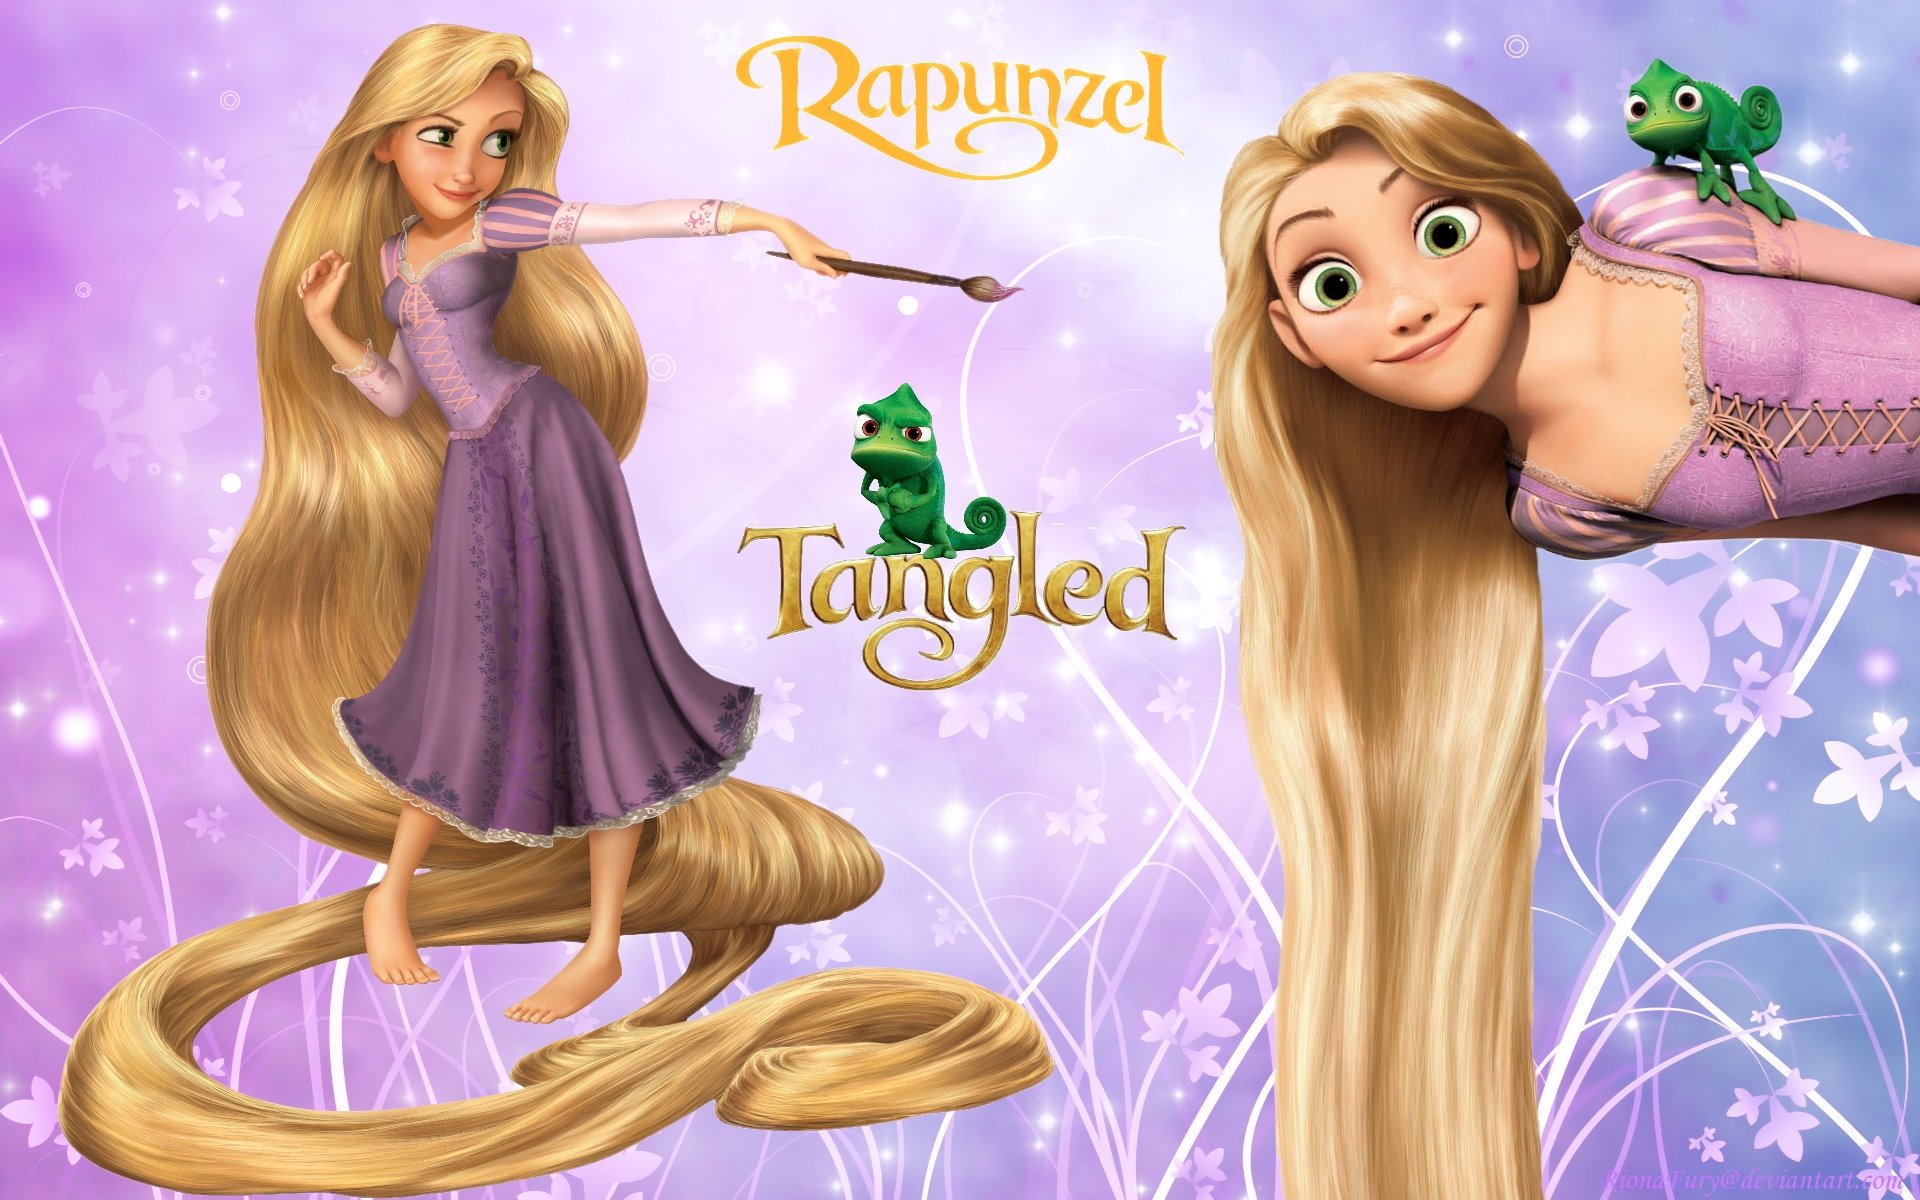 Disney Princess Rapunzel Tangled Free Hd Wallpaper 1920 1200